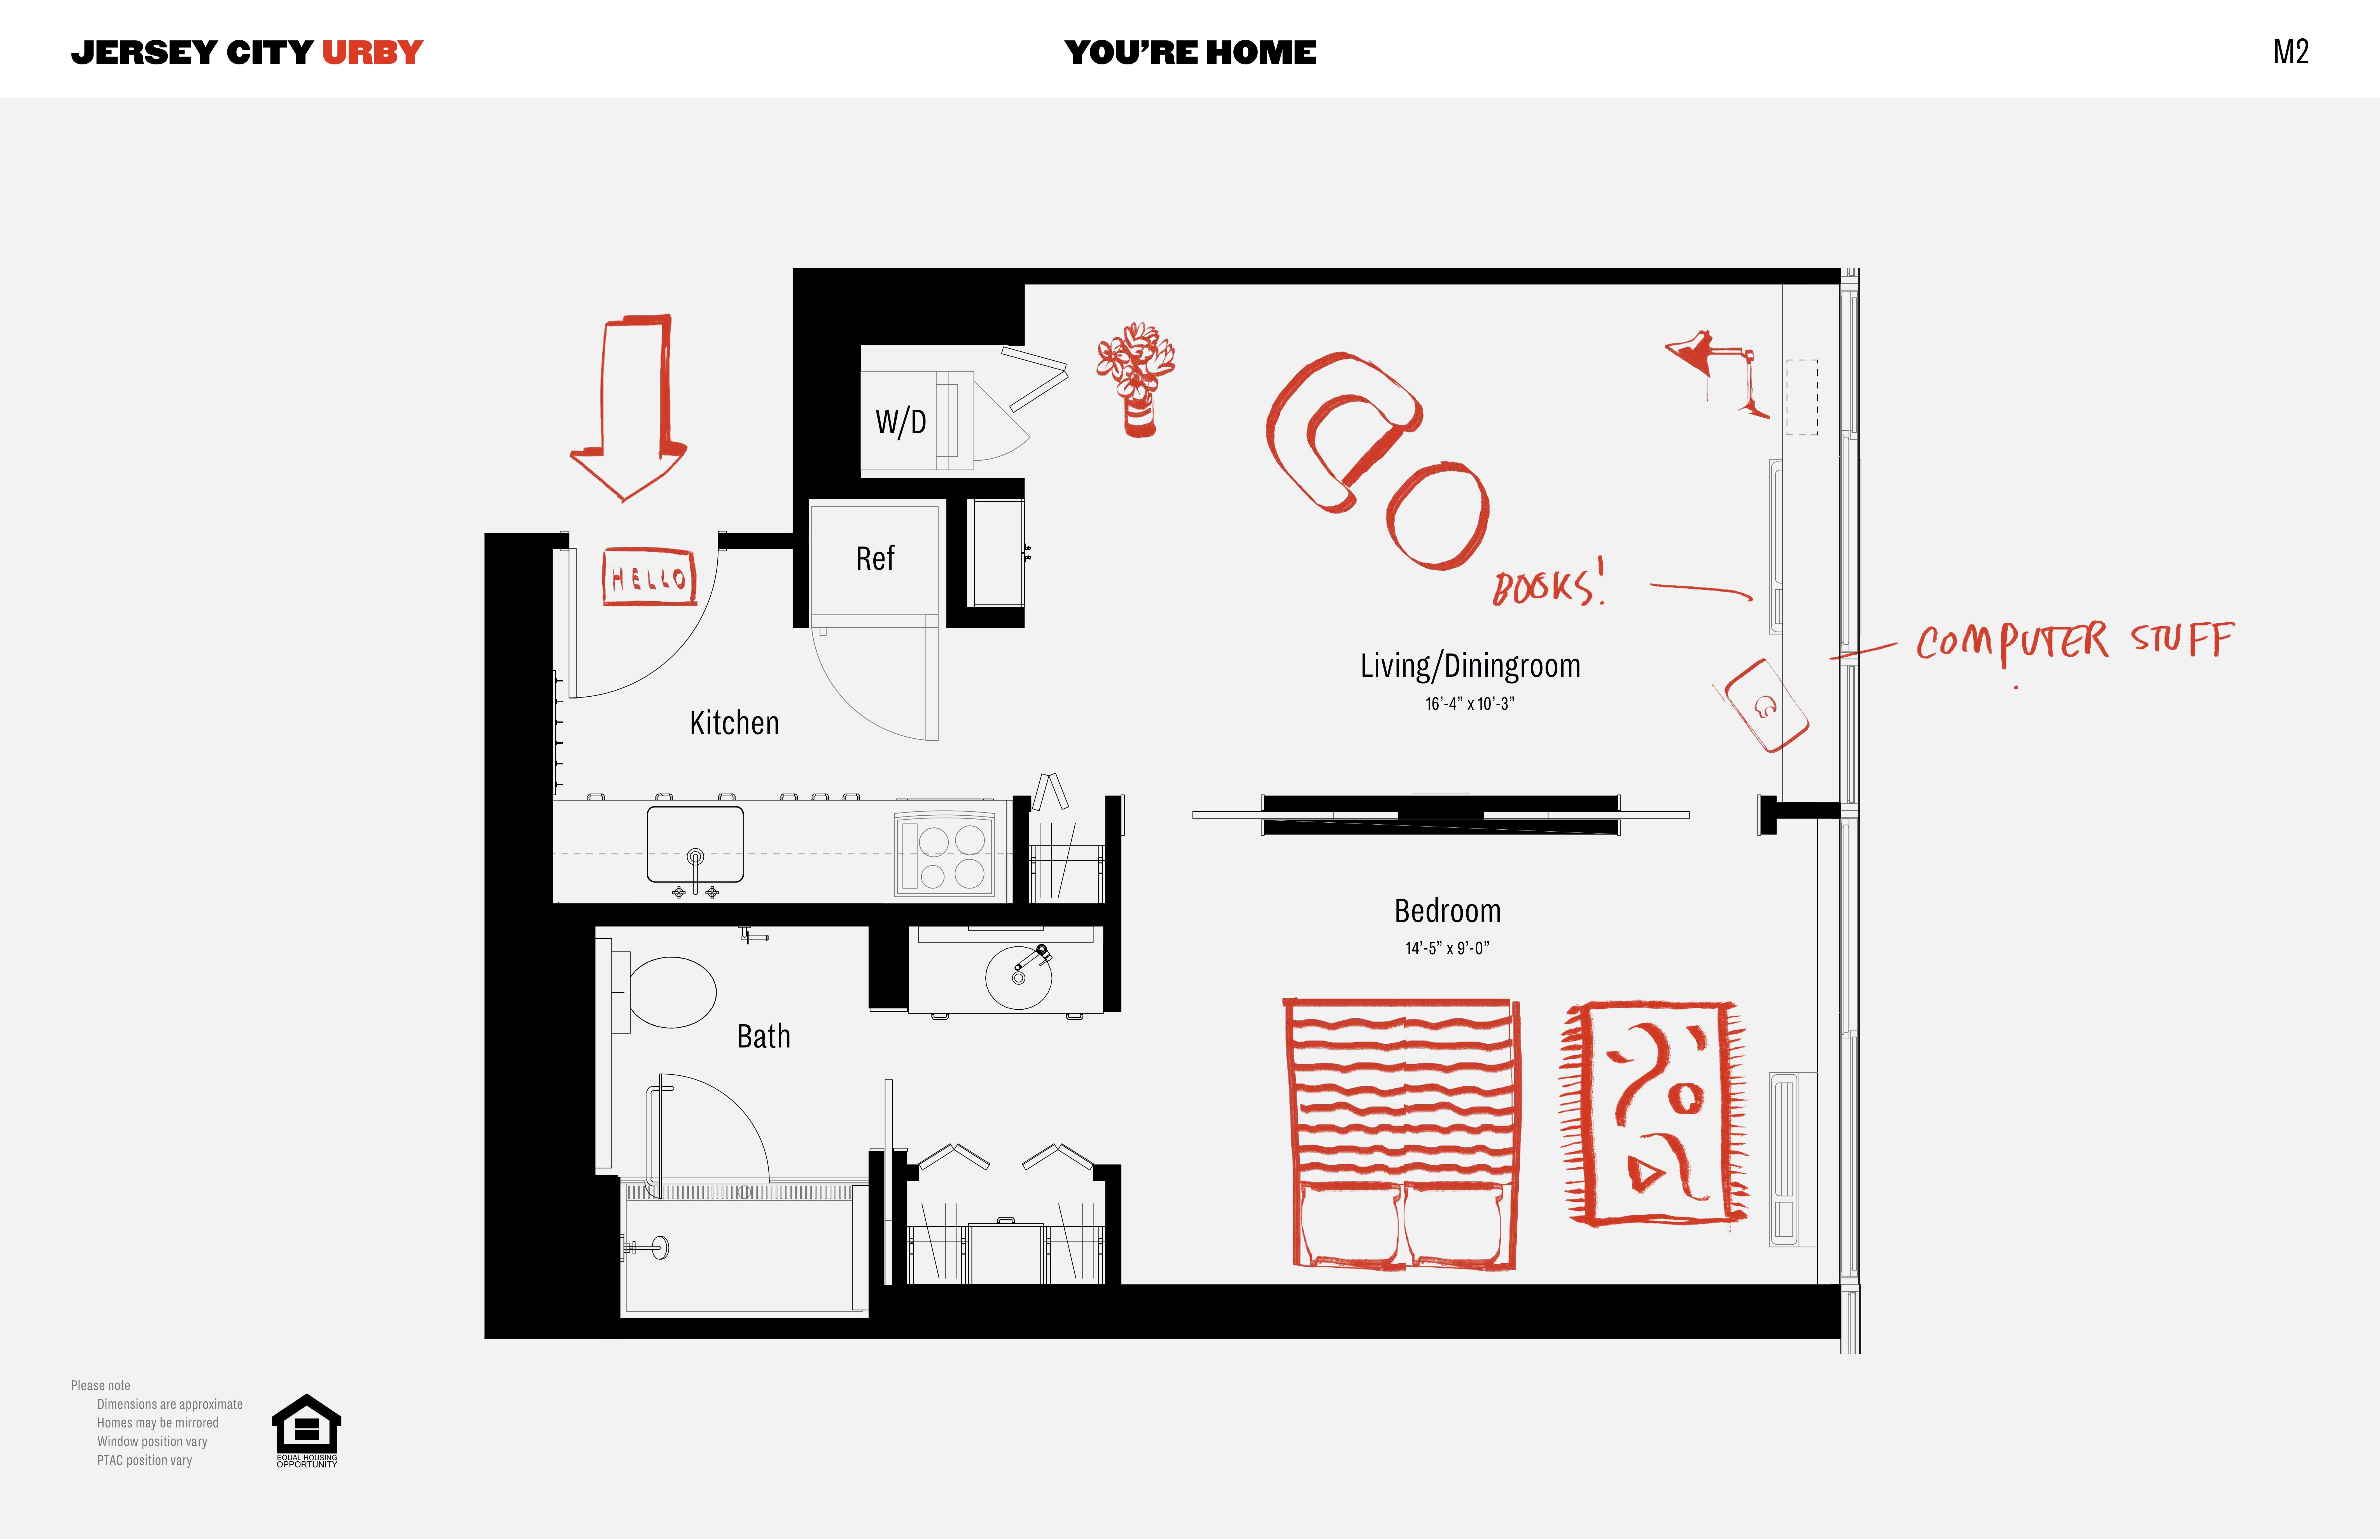 1 Bedroom Apartments In Jersey City Home De Inspiration